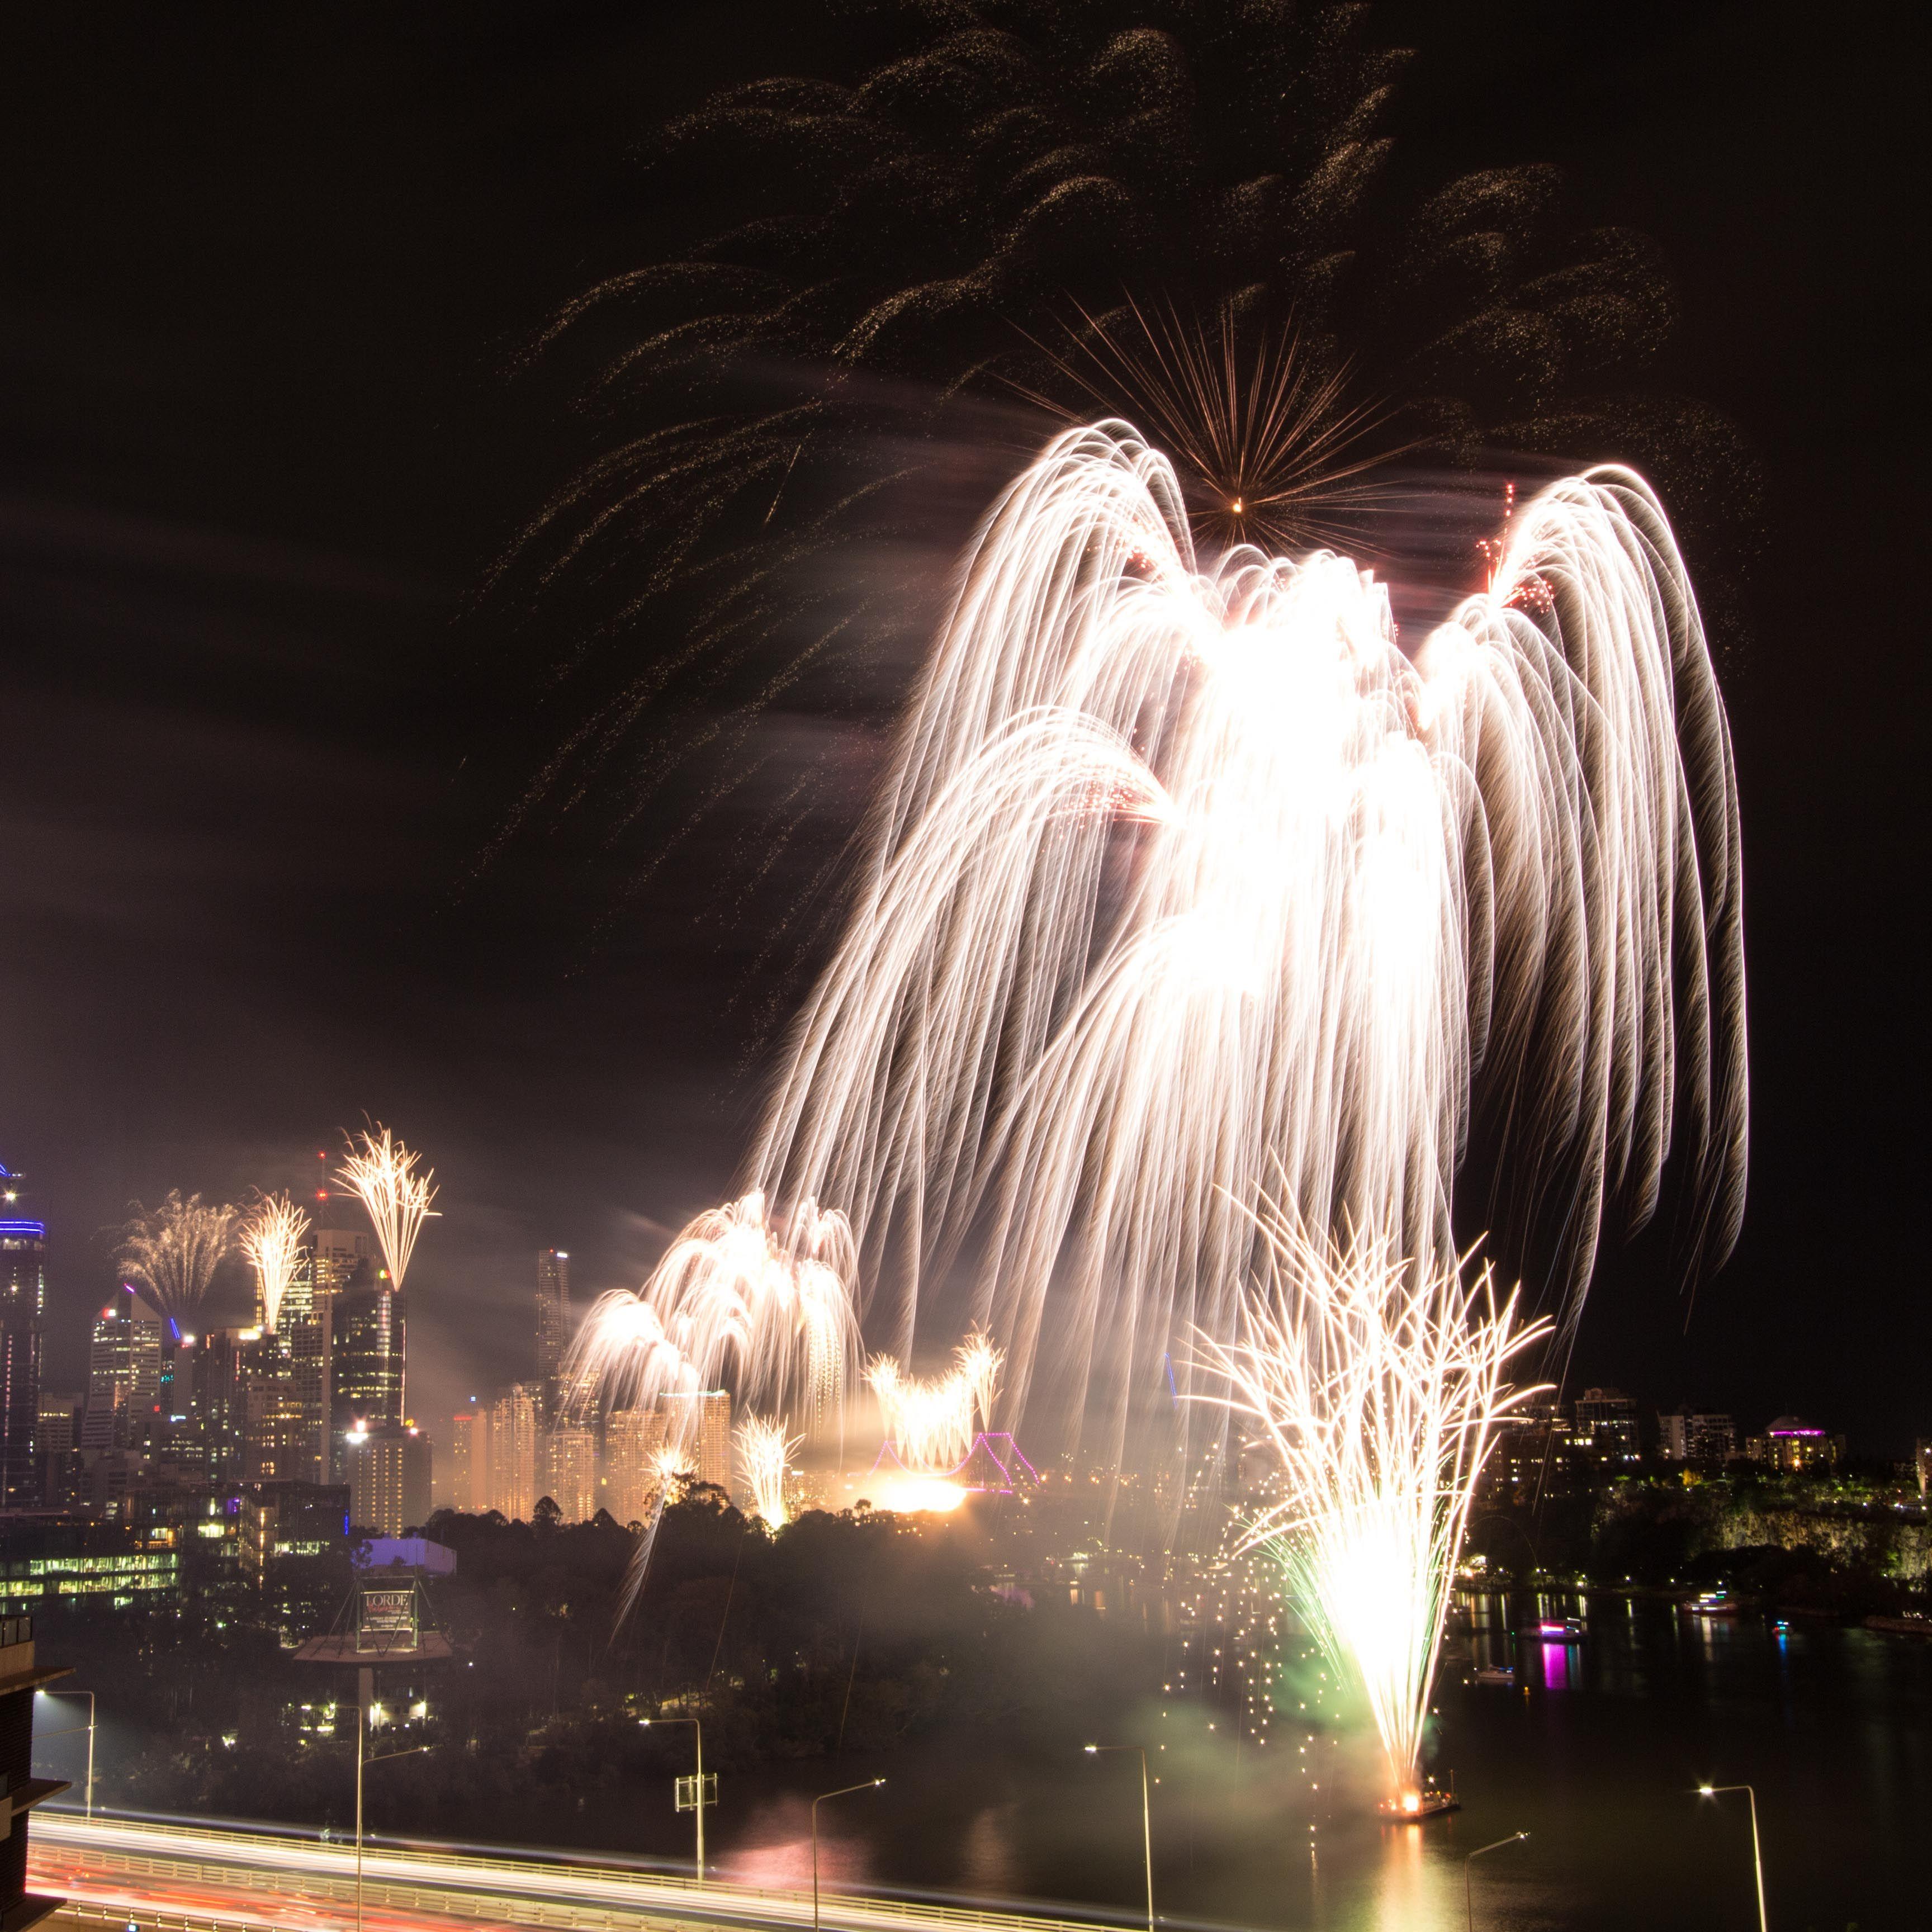 Brisbane RiverFire 2017. fireworks